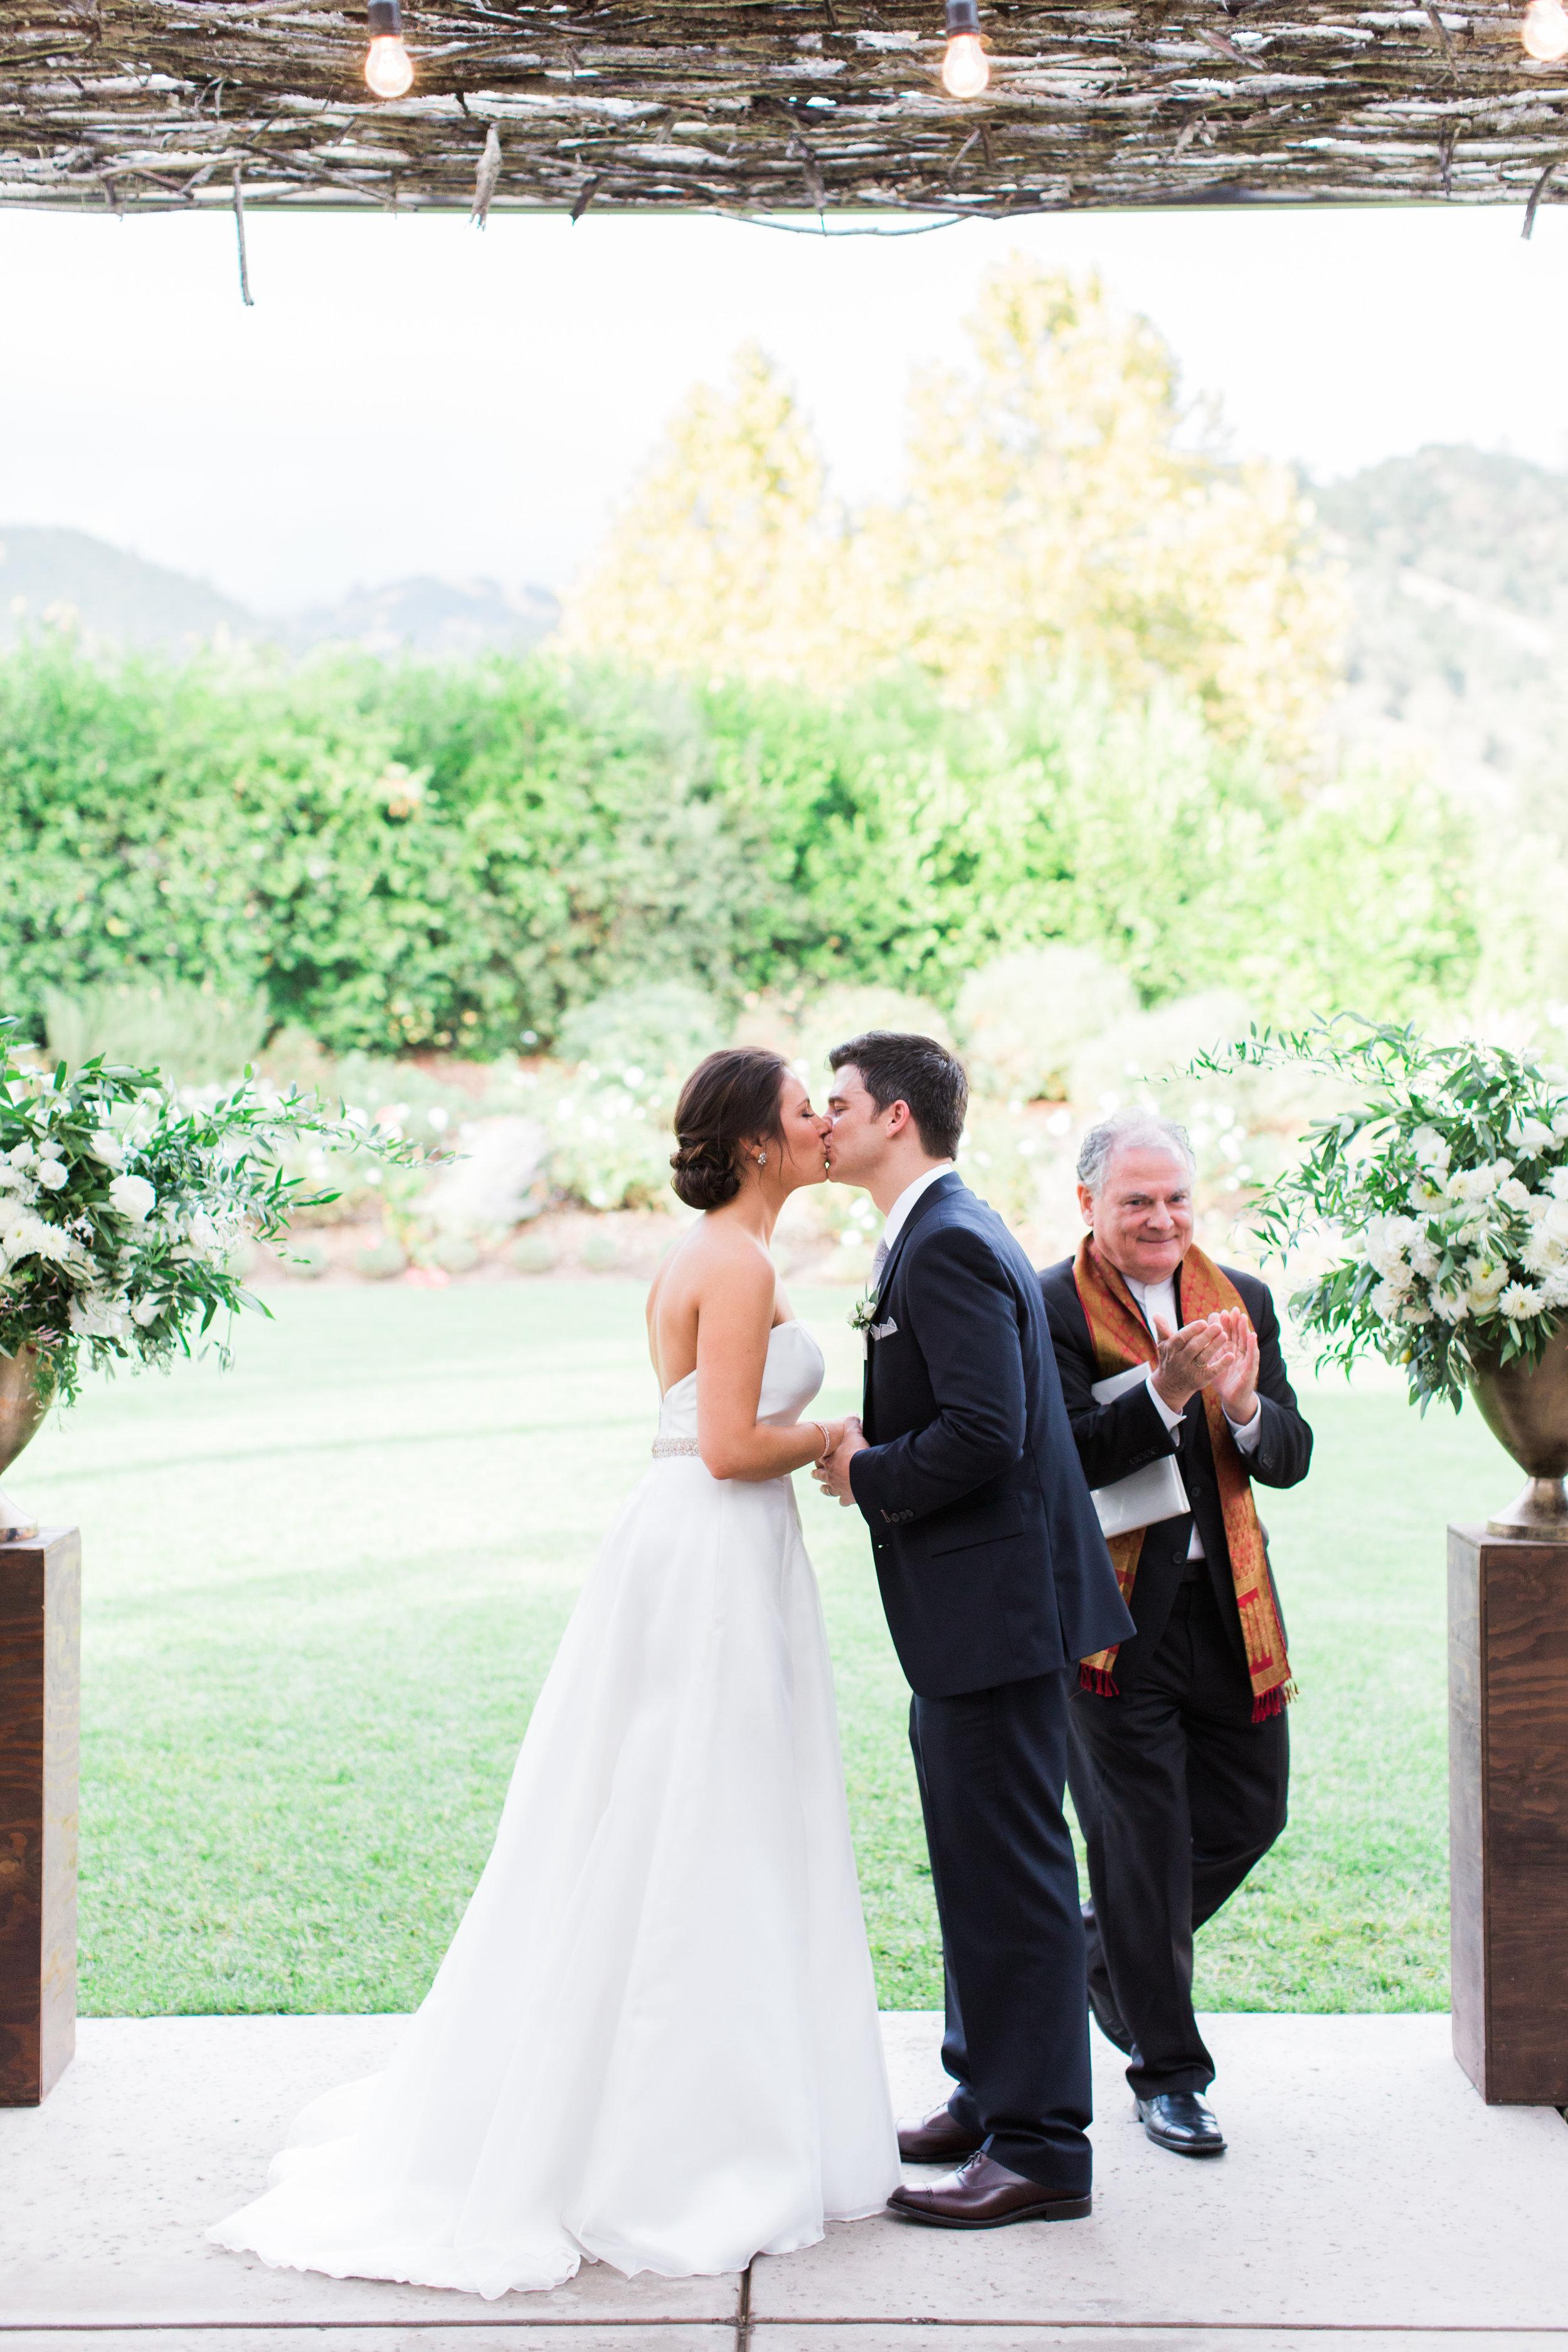 intimate-wedding-at-solage-calistoga-in-napa-73.jpg